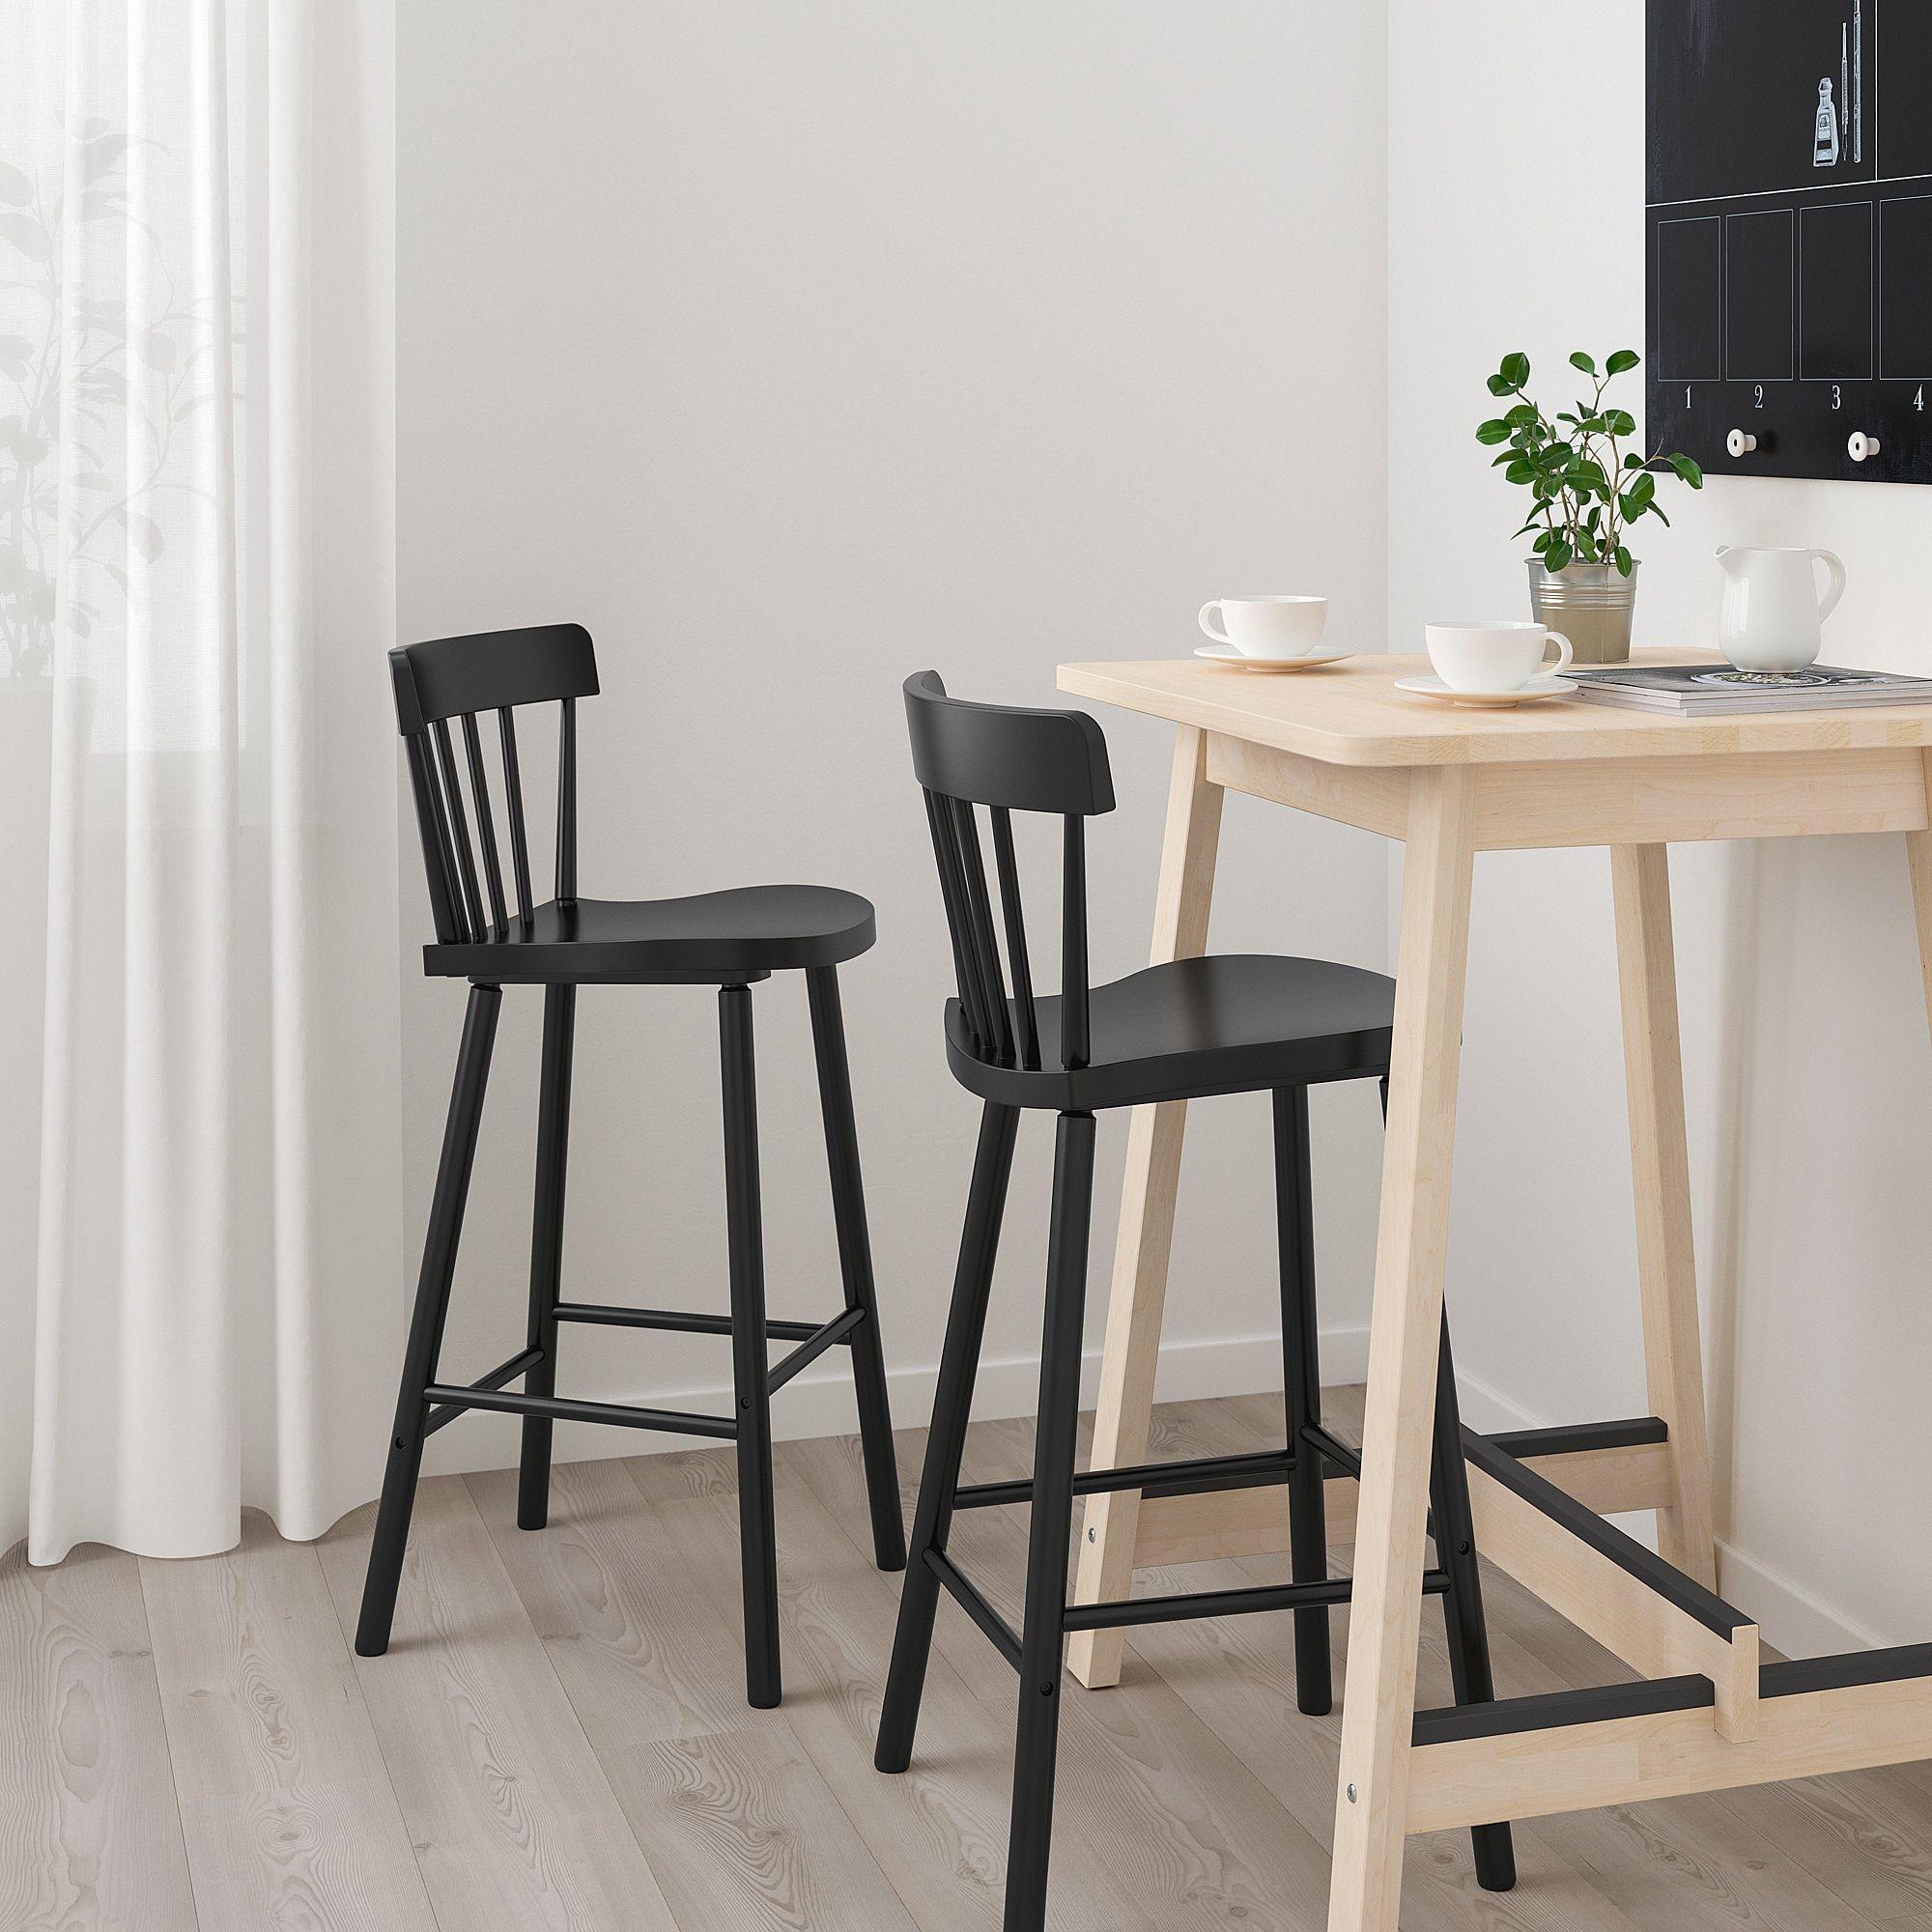 Ikea Norraker Norraryd Birch Black Bar Table And 2 Bar Stools Tabouret De Bar Table Haute Table De Petit Dejeuner